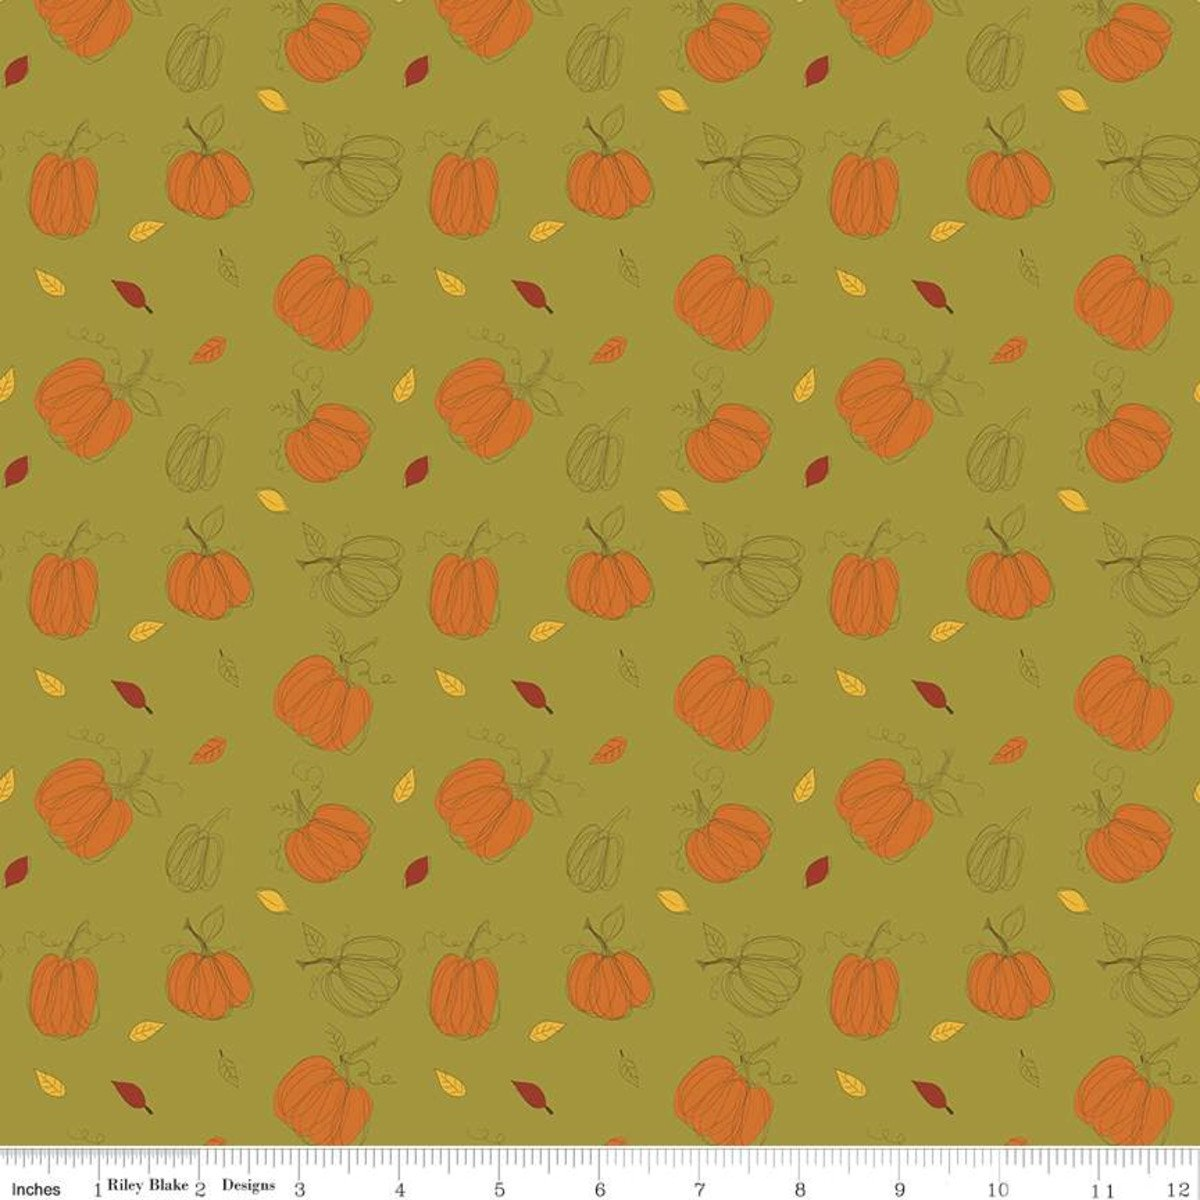 Adel in Autumn - Pumpkins - Olive